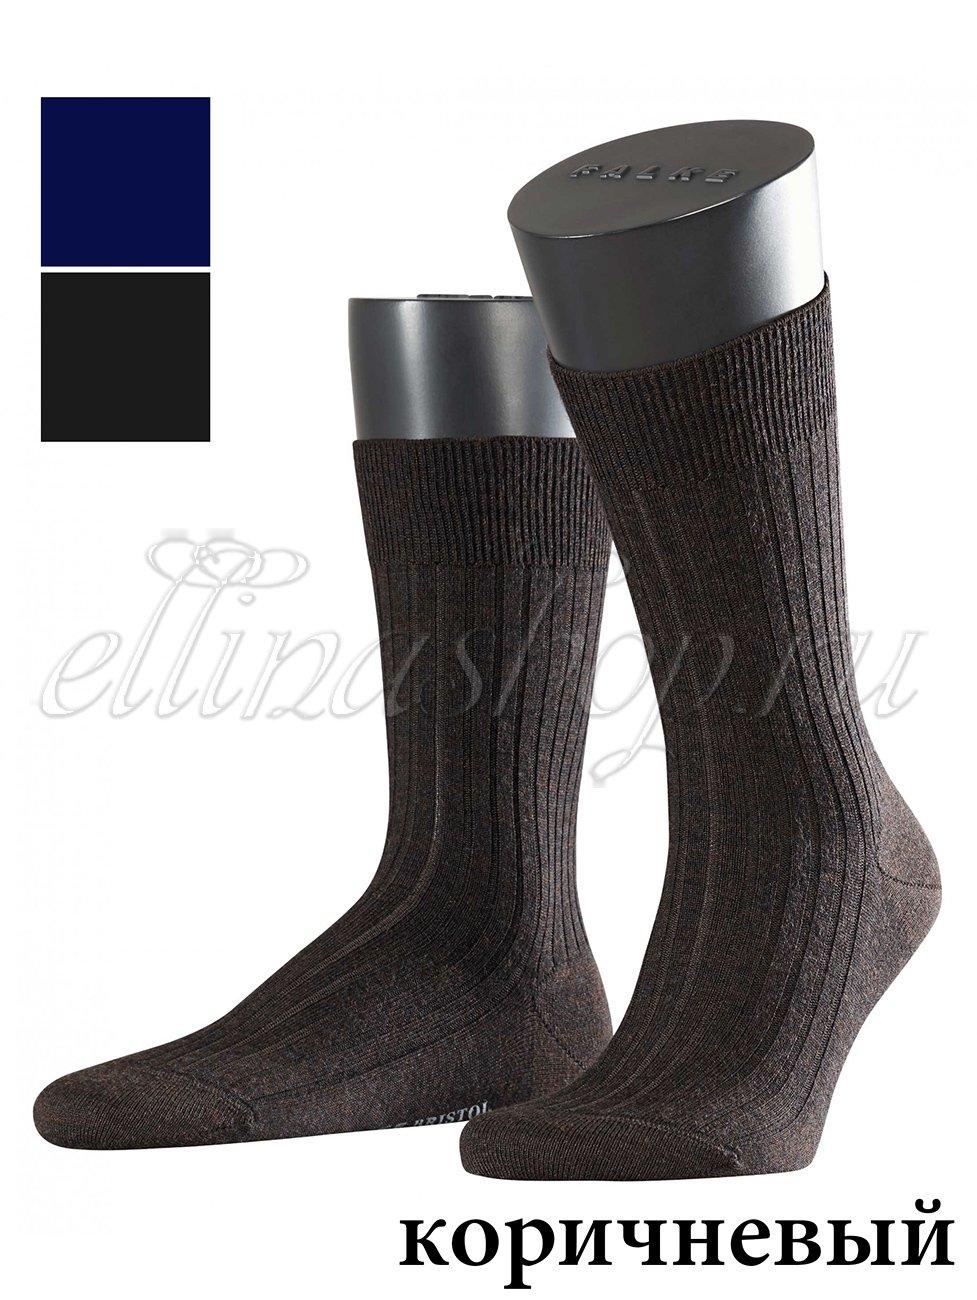 Мужские носки 14415 Bristol рубчик Falke